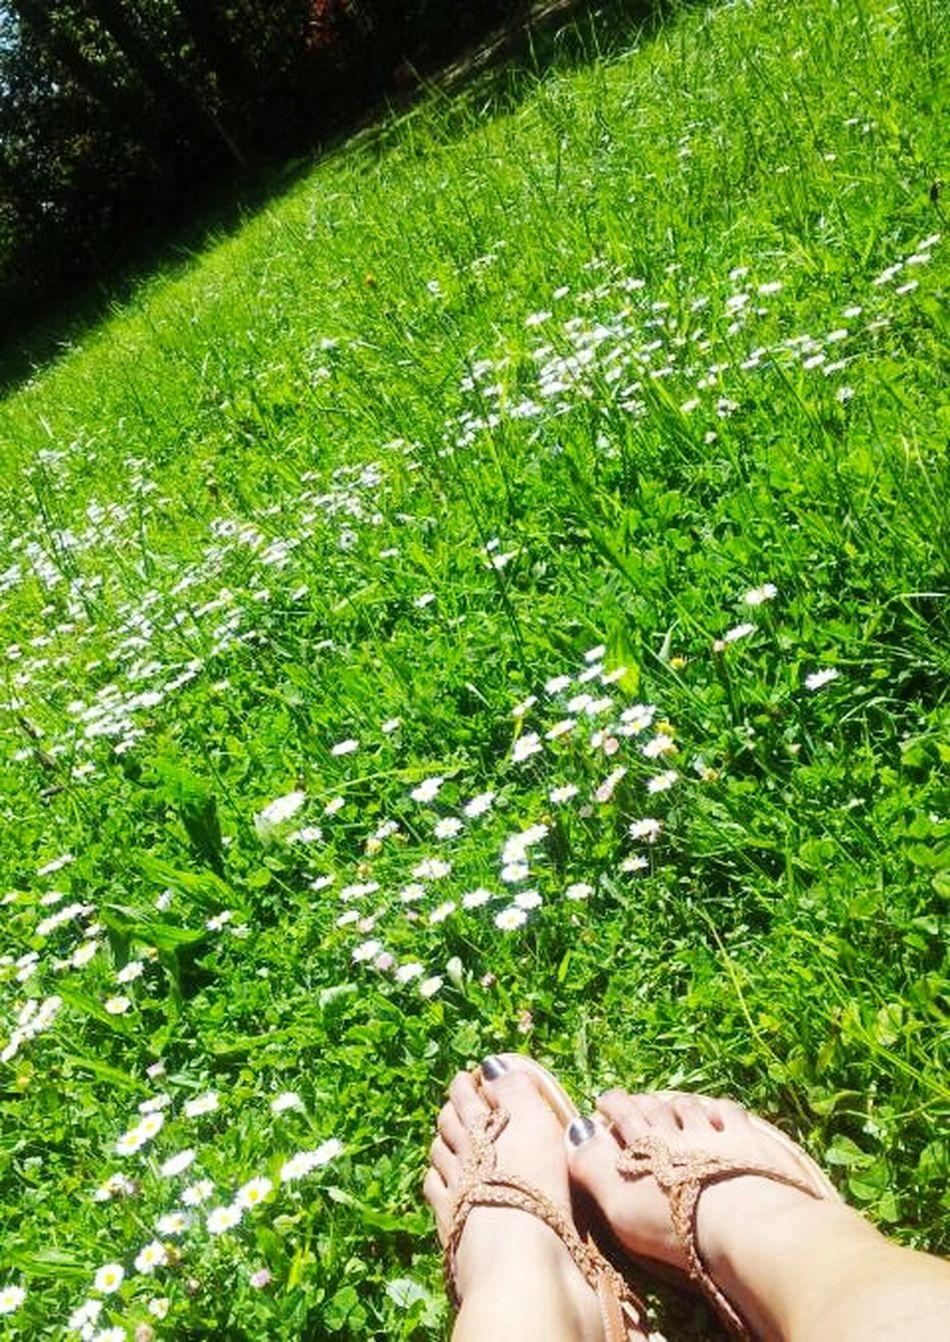 Relaxing Summer Vibes 😊 Enjoying Life Sunrise Grass Daisies Nature